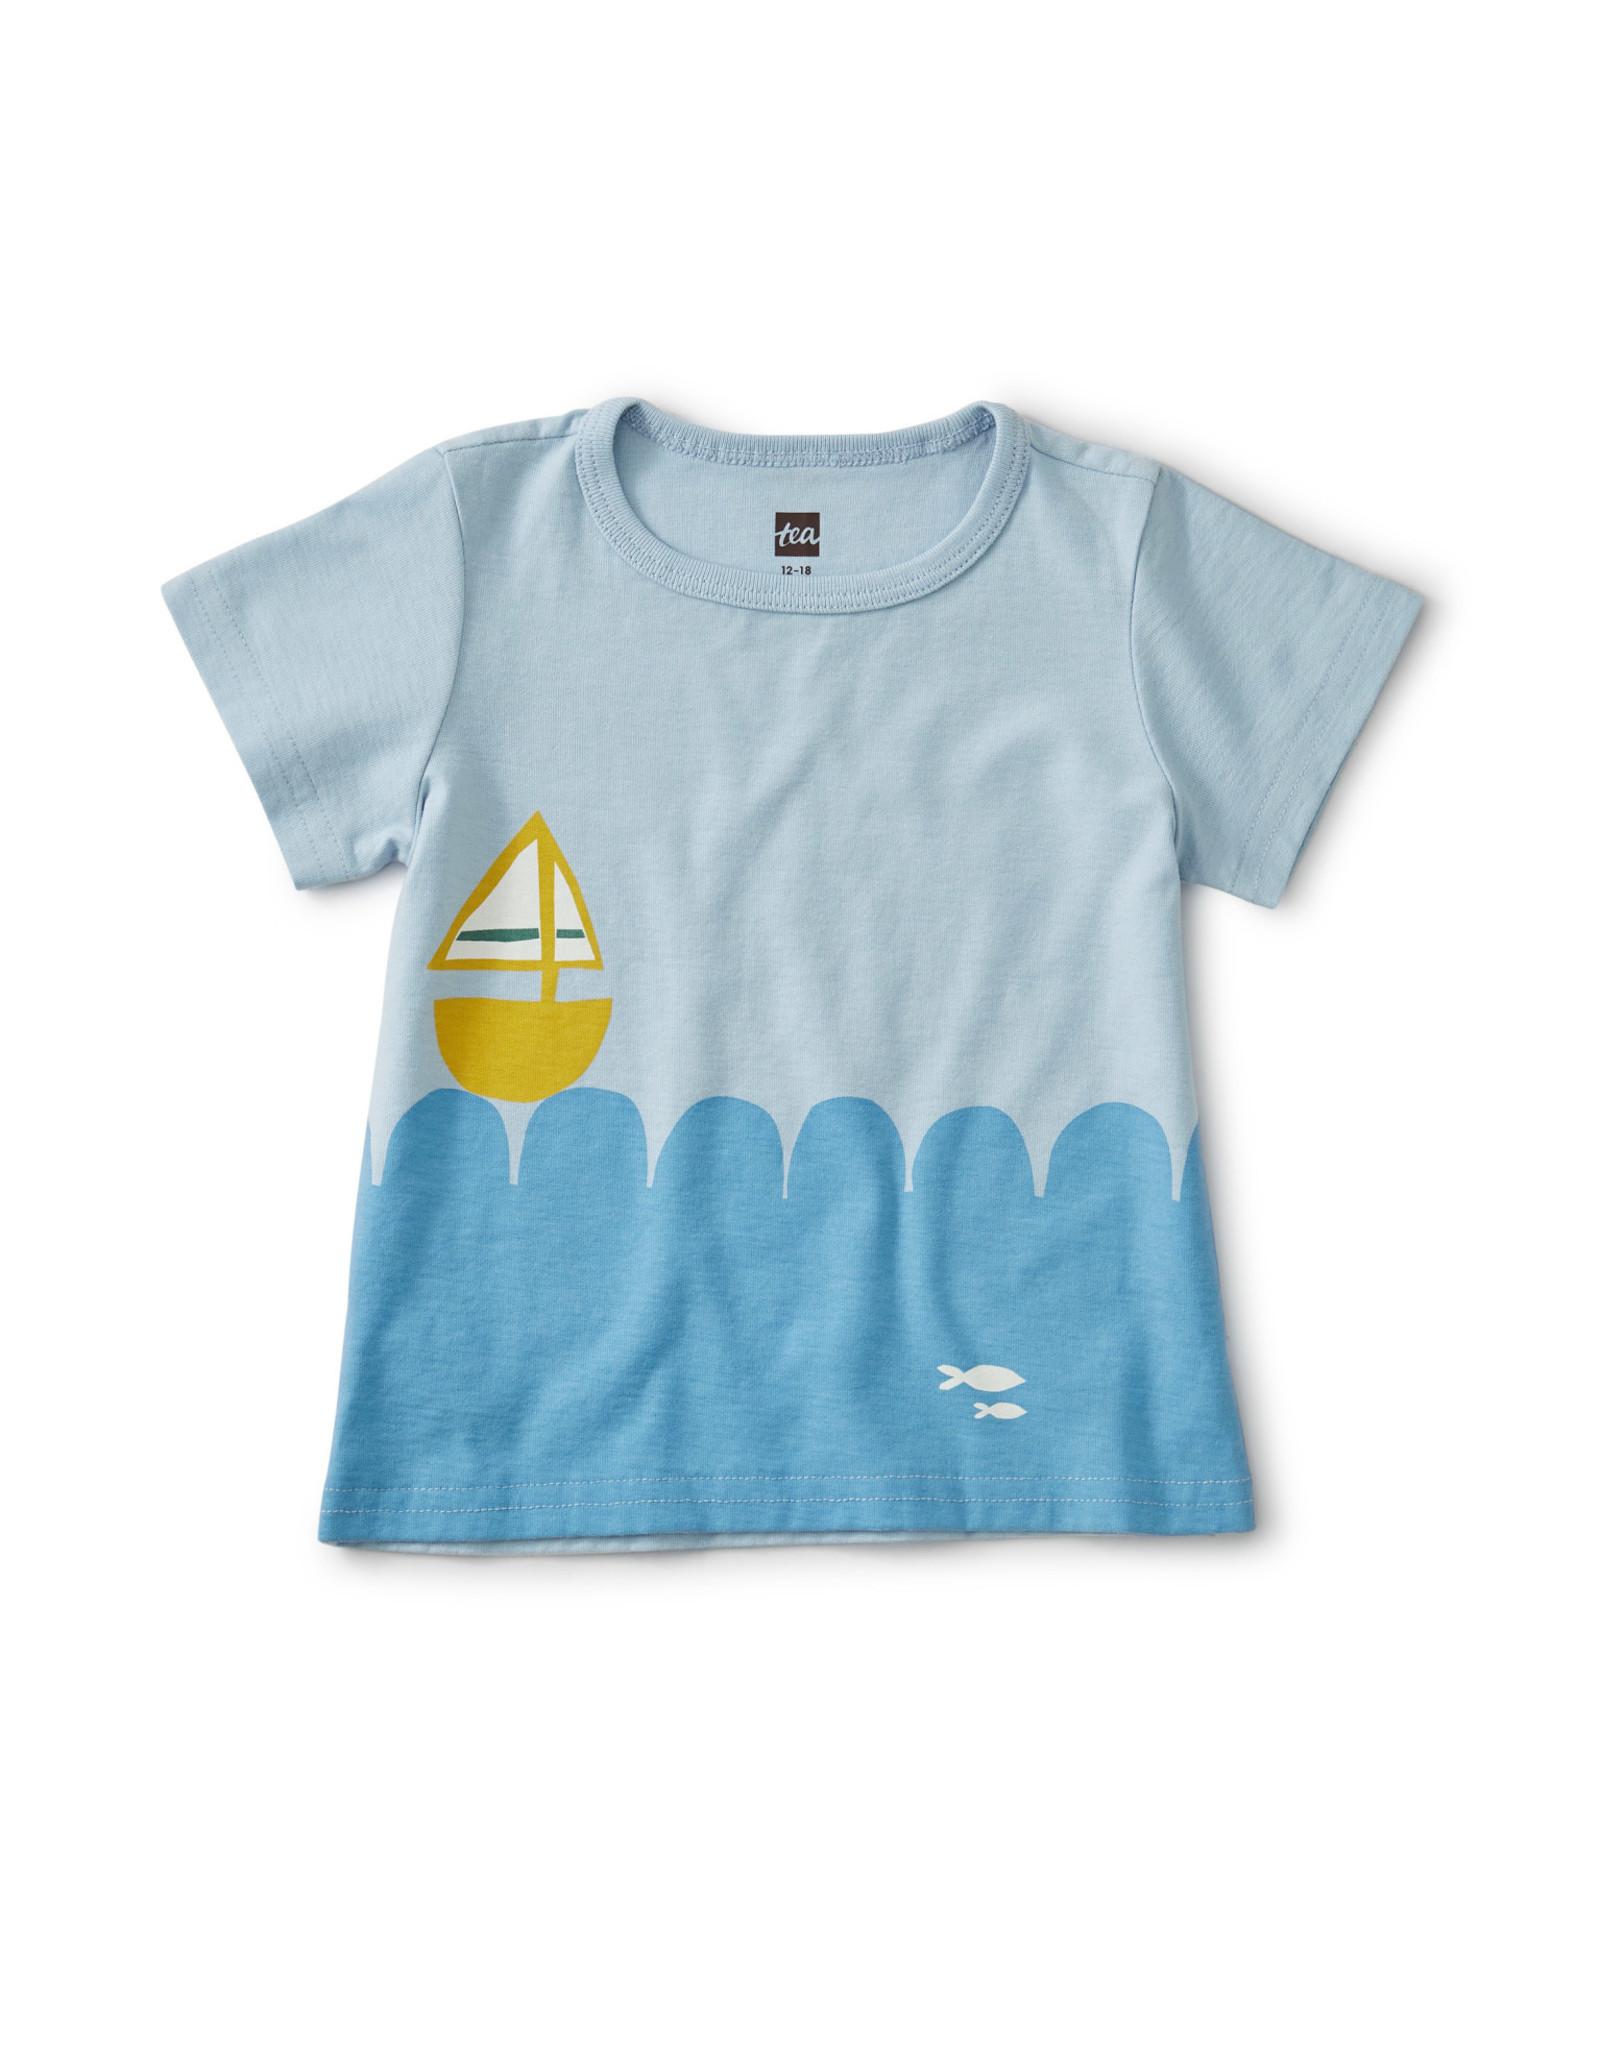 SET SAIL BABY TEE - CASHMERE BLUE